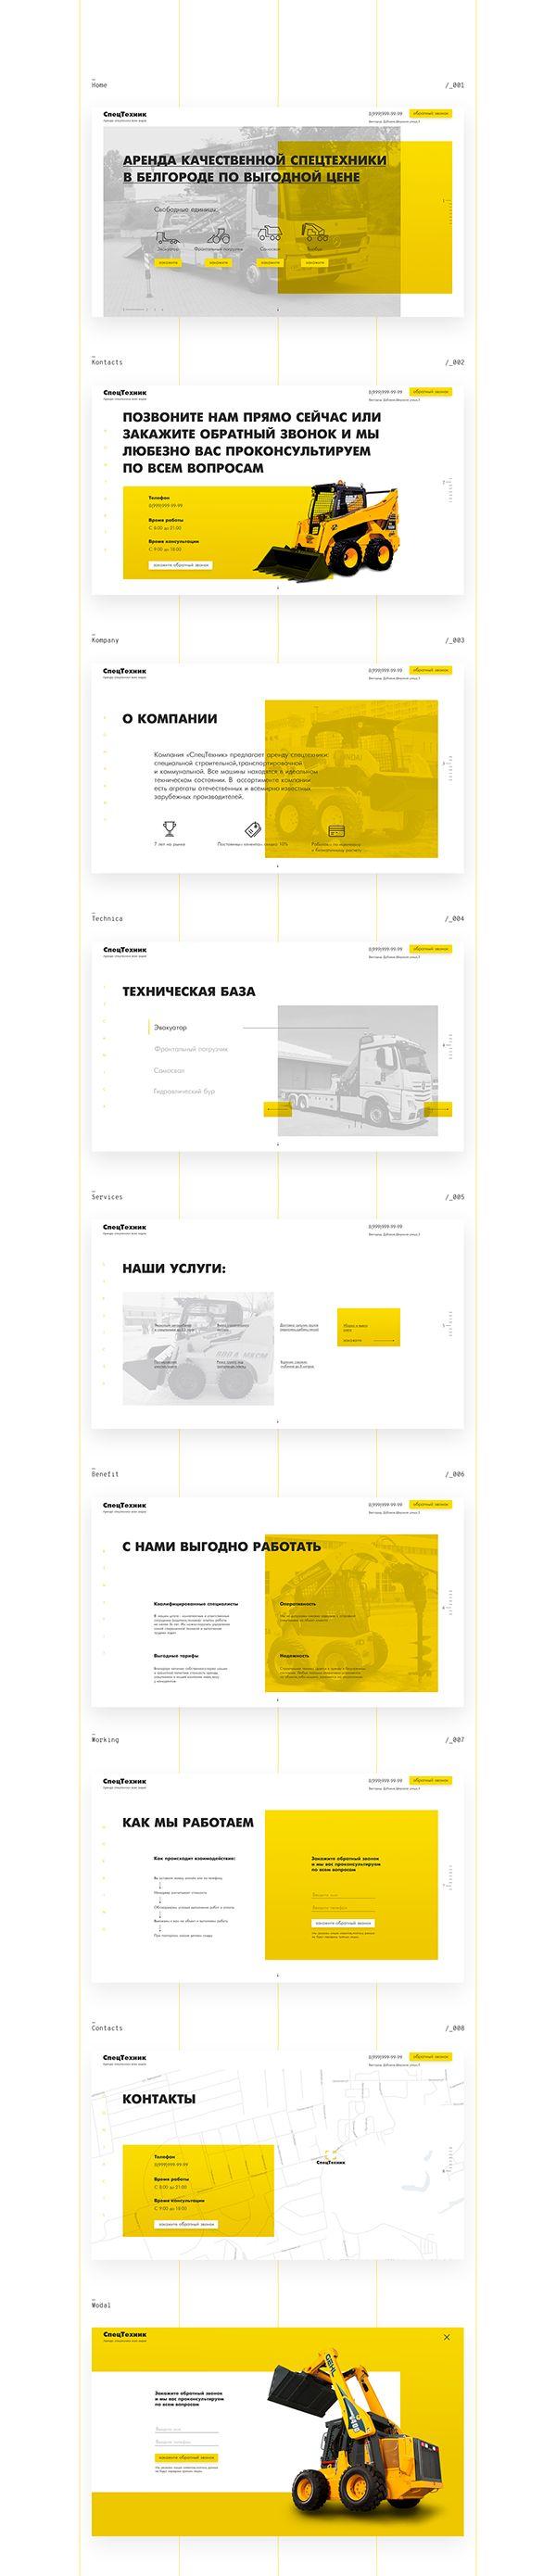 Landing Page | Video presentation | Motion web design | BOGOMAZOVART